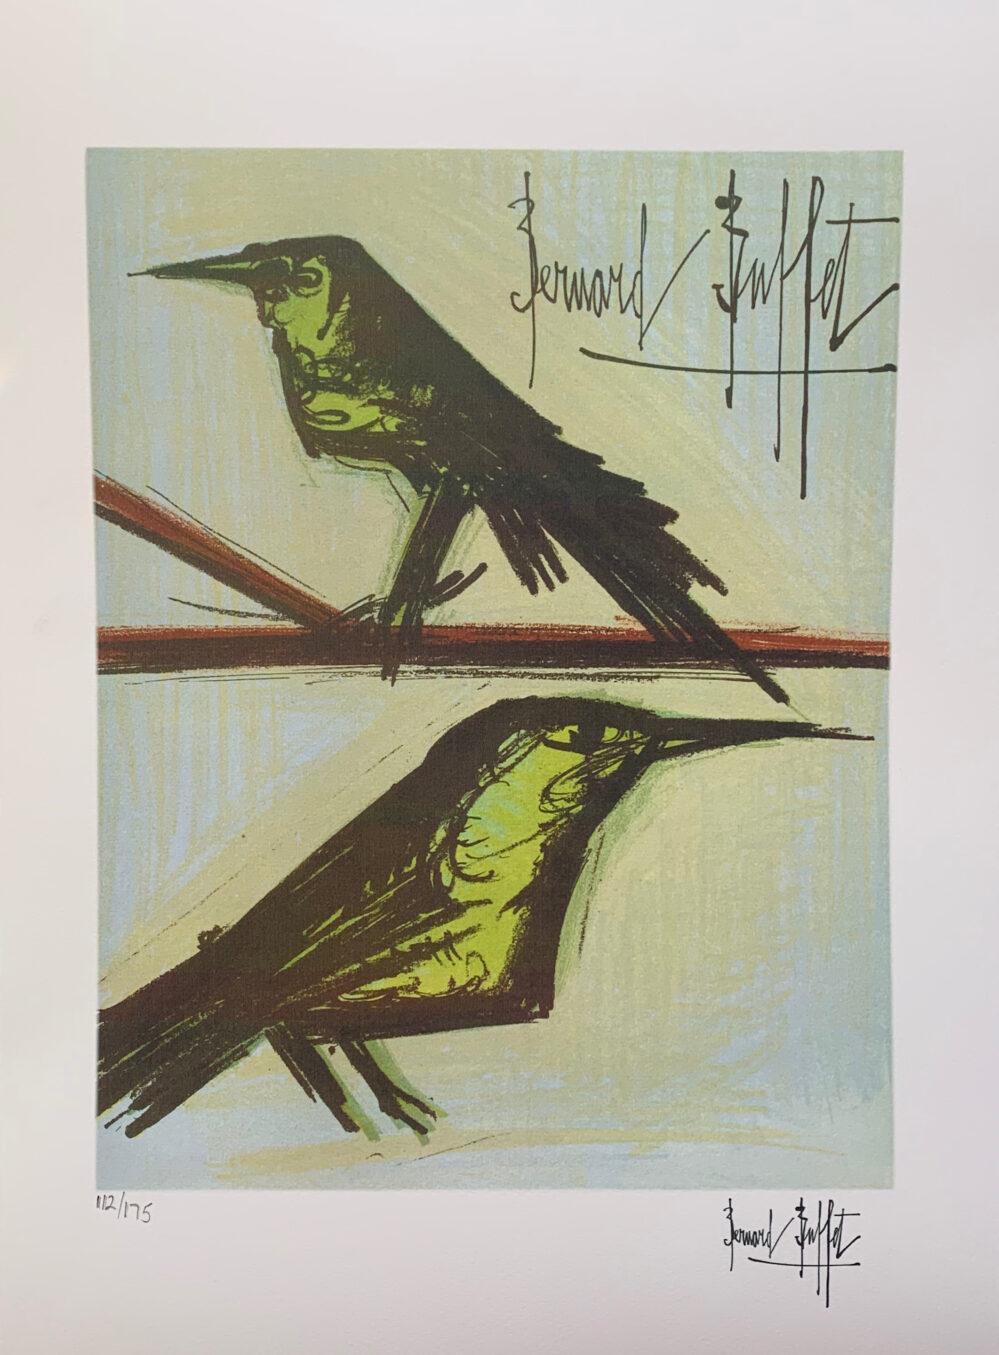 Bernard Buffet BIRDS Facsimile Signed Limited Edition Giclee